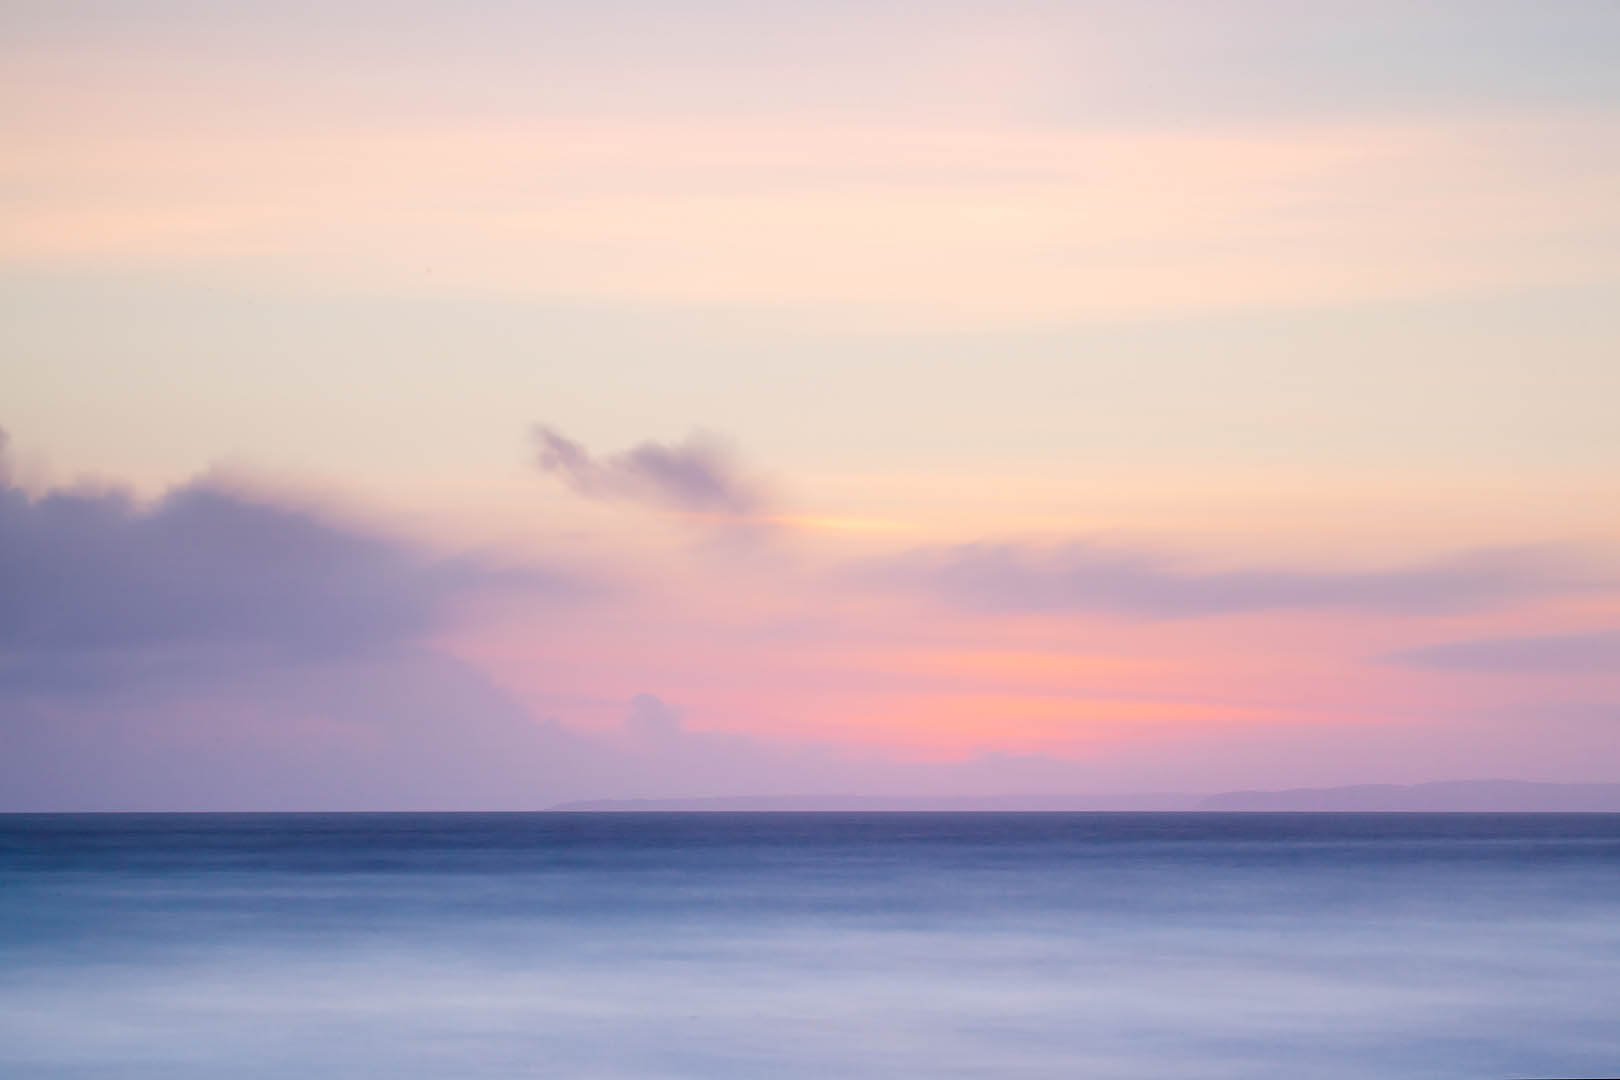 Keyhaven Horizon #6